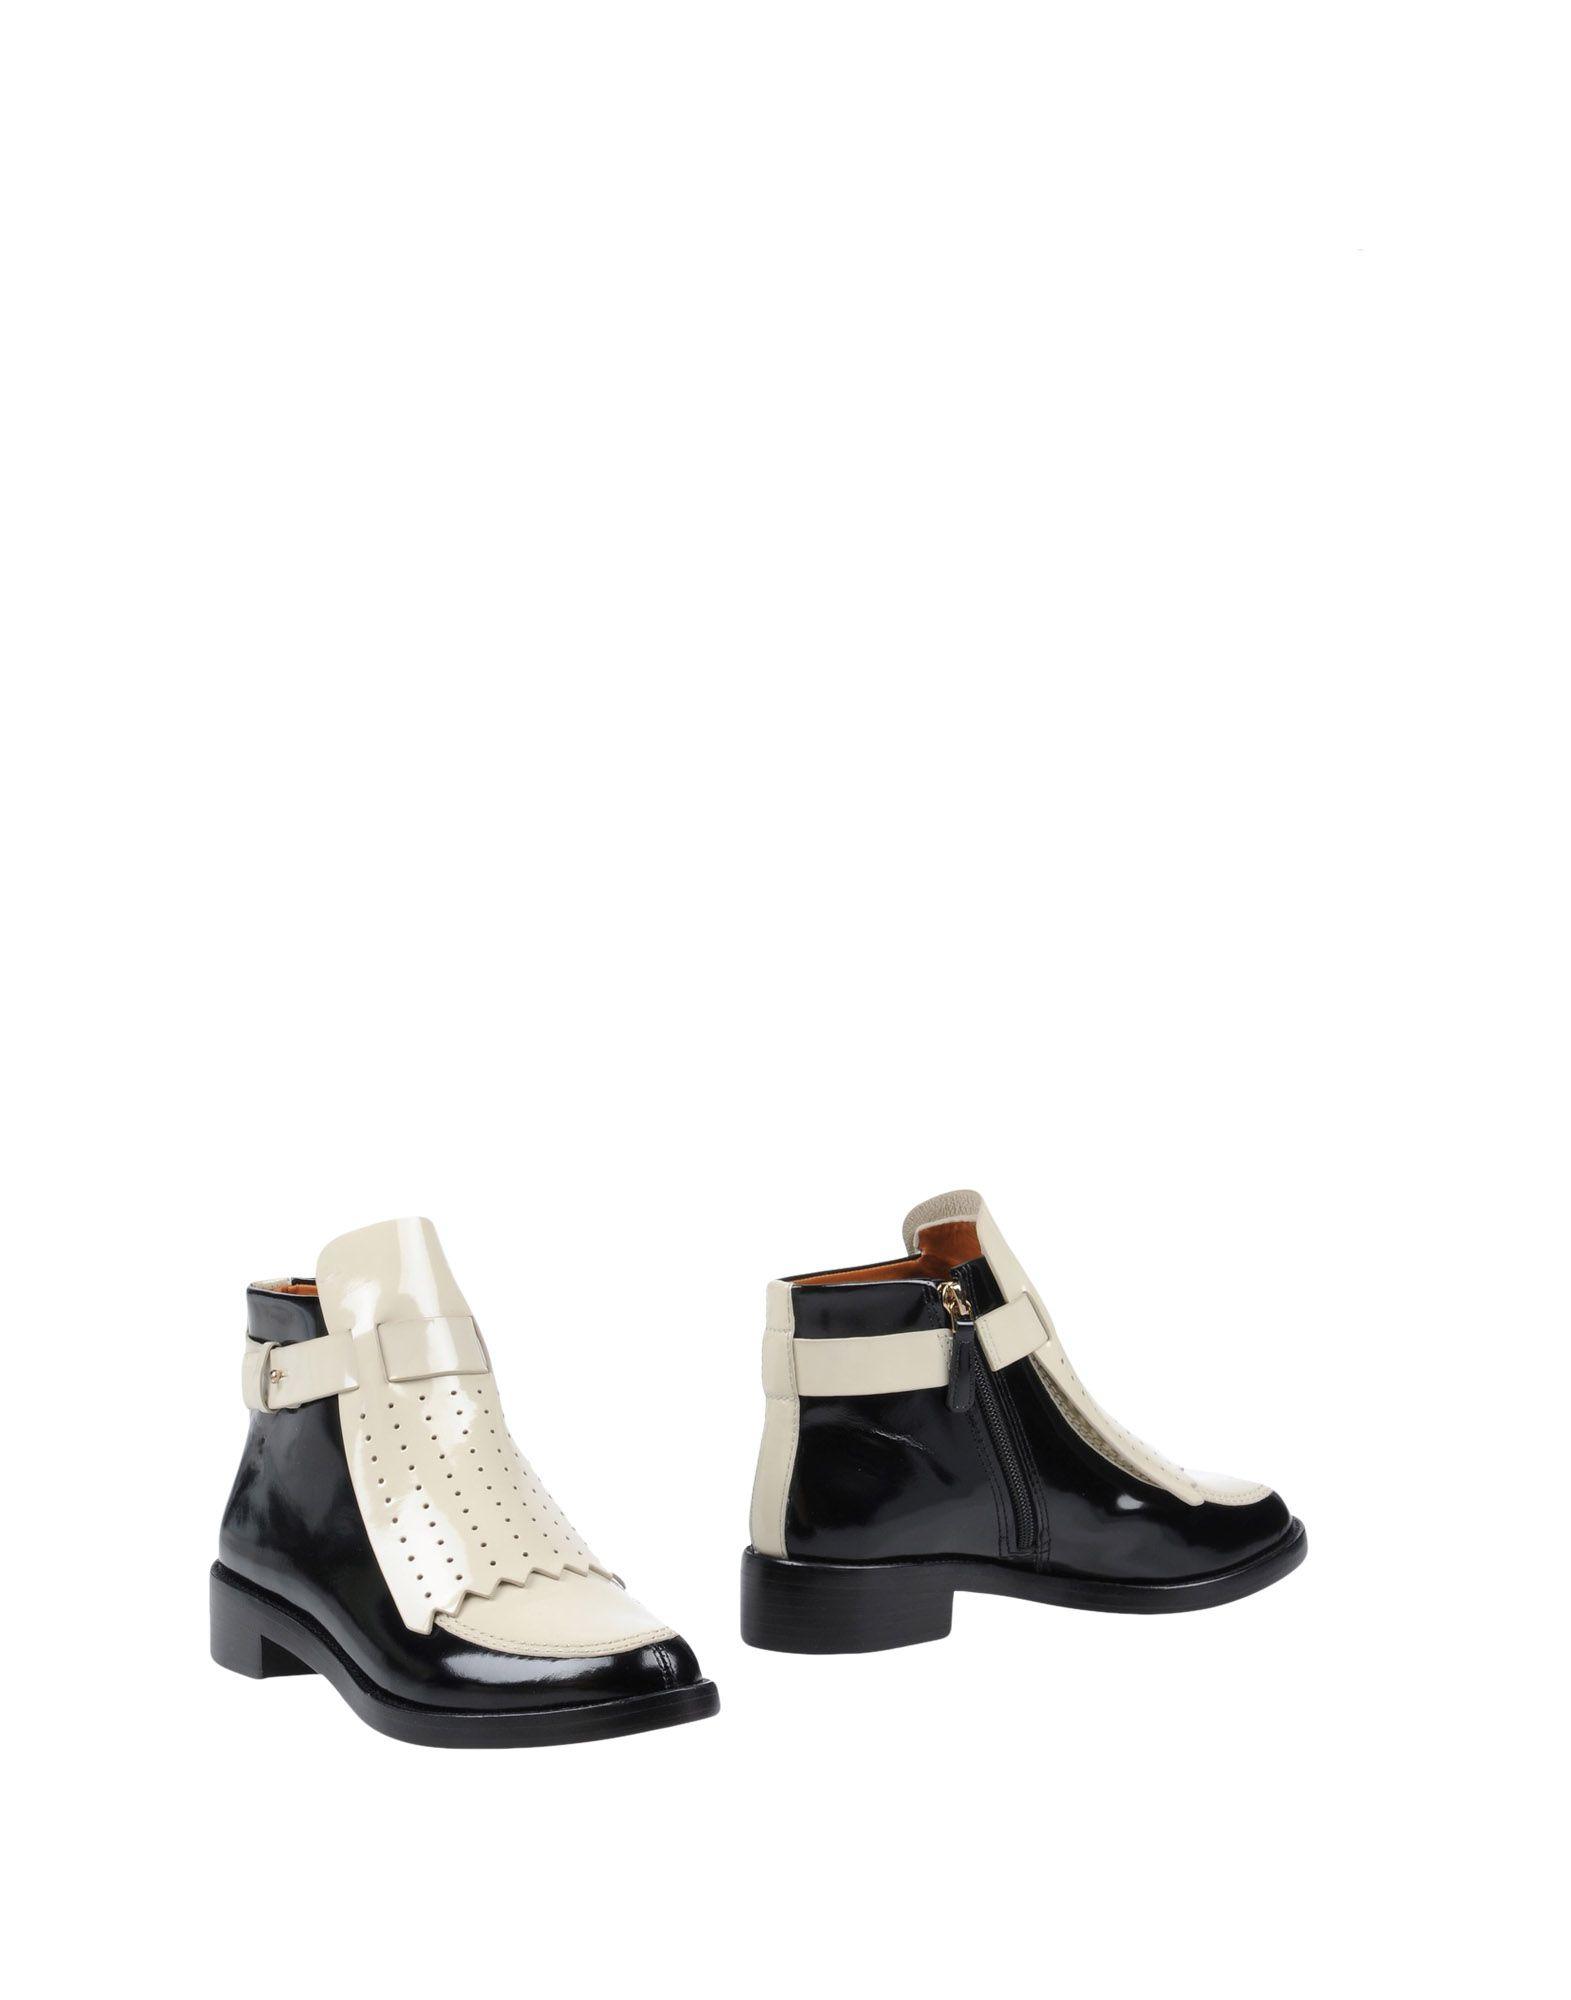 TORY BURCH Полусапоги и высокие ботинки tory burch замшевые полусапоги